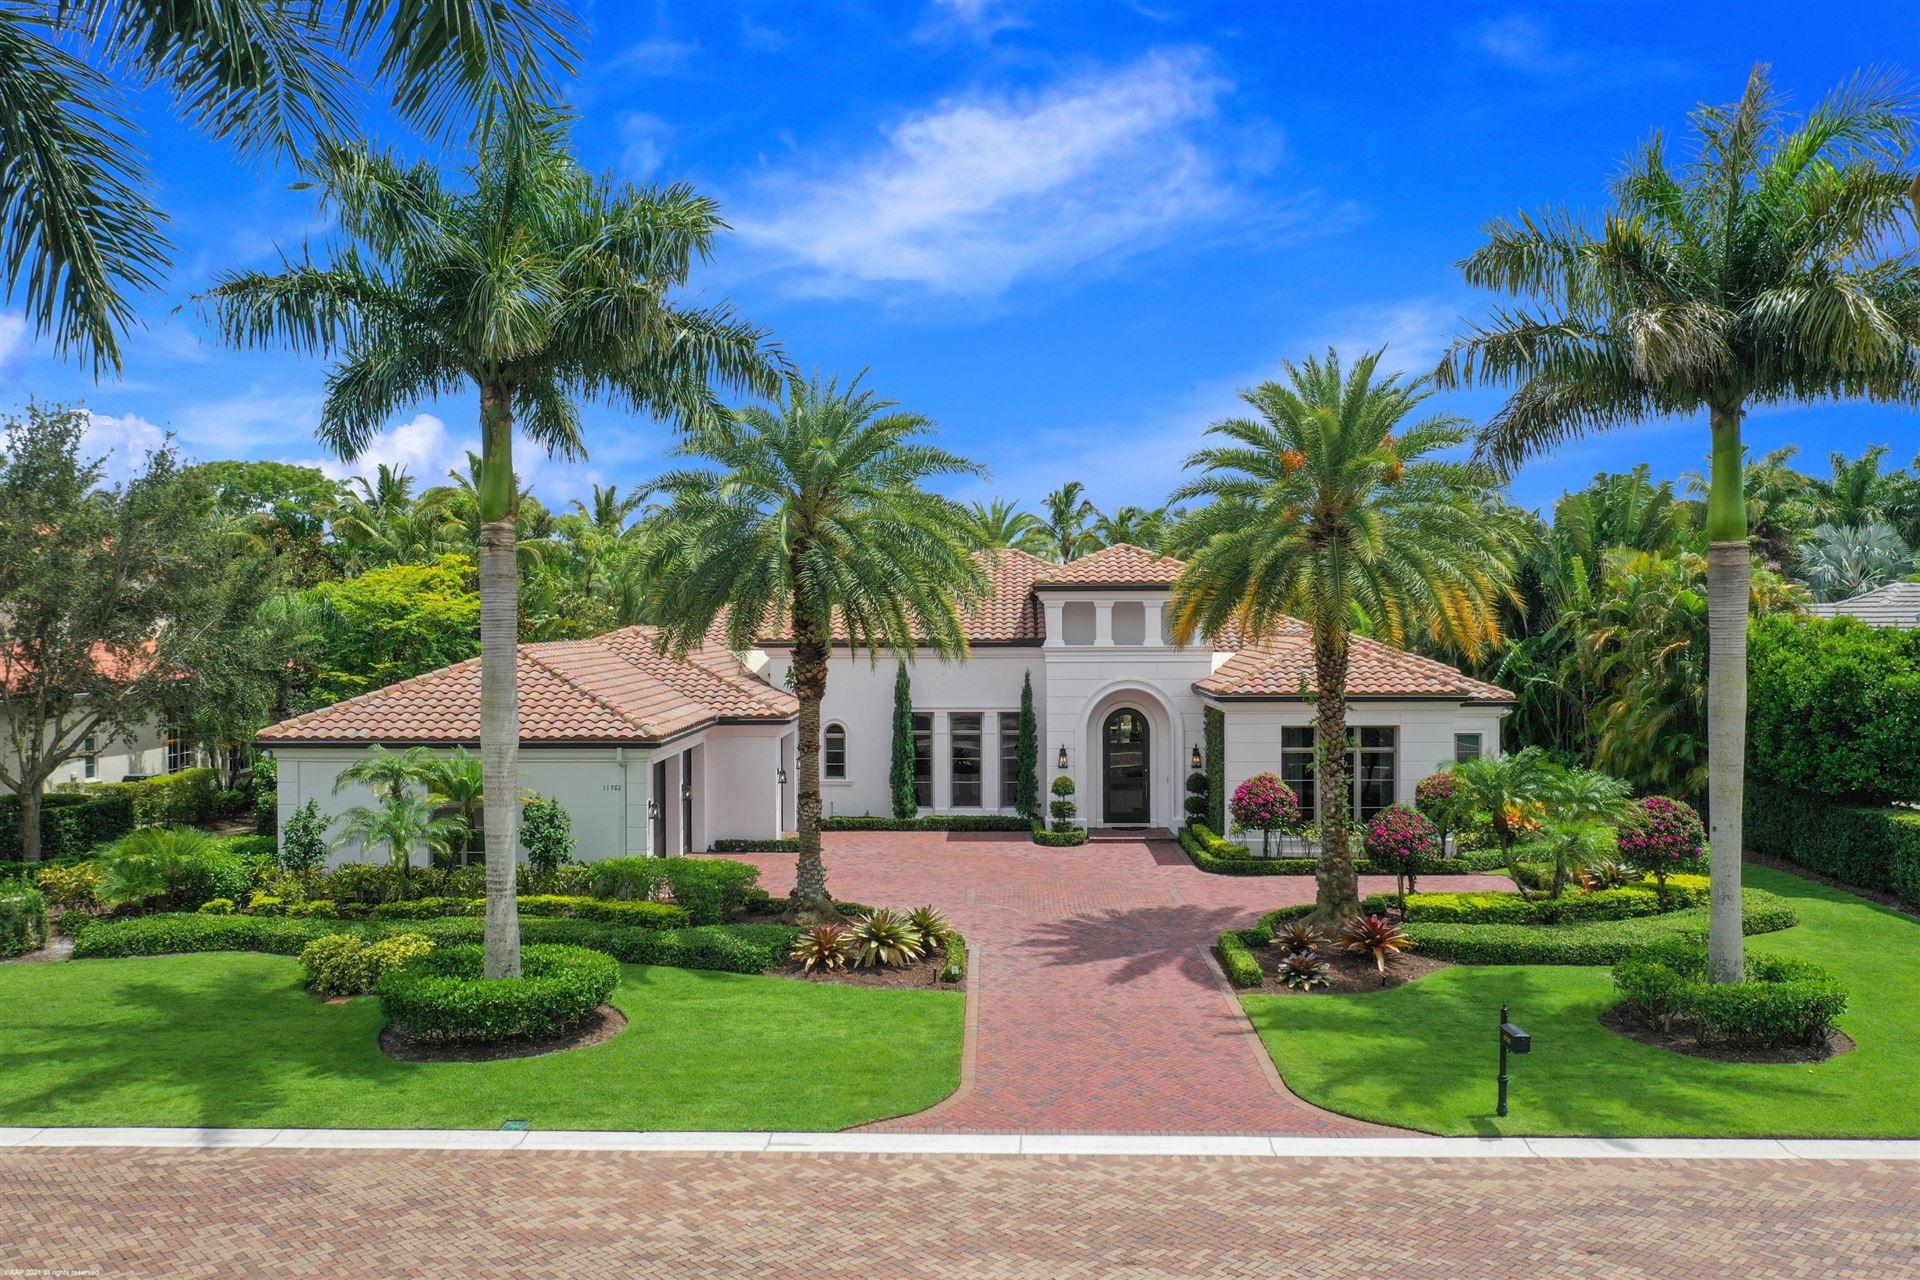 Photo of 11762 Calla Lilly Court, Palm Beach Gardens, FL 33418 (MLS # RX-10726213)